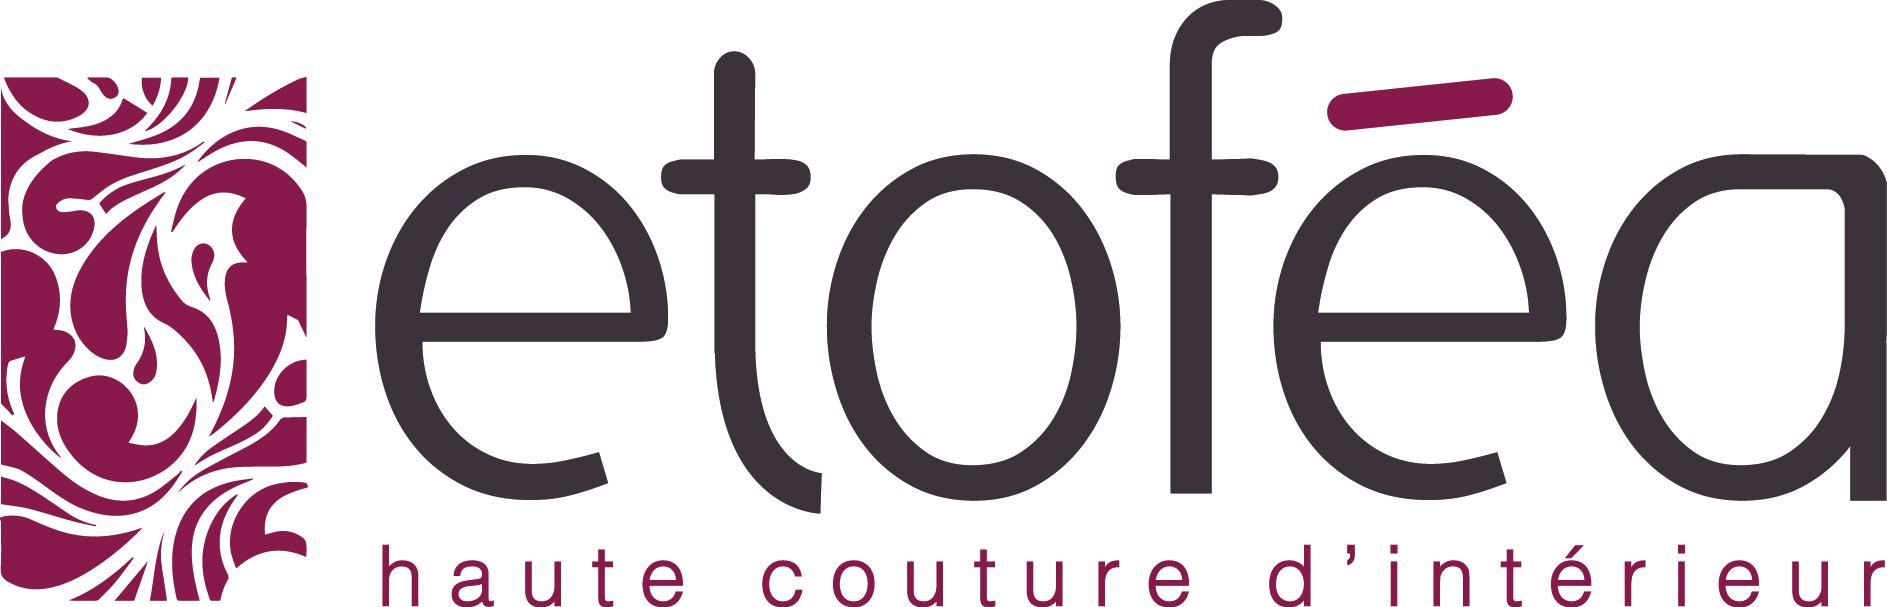 logo etofea